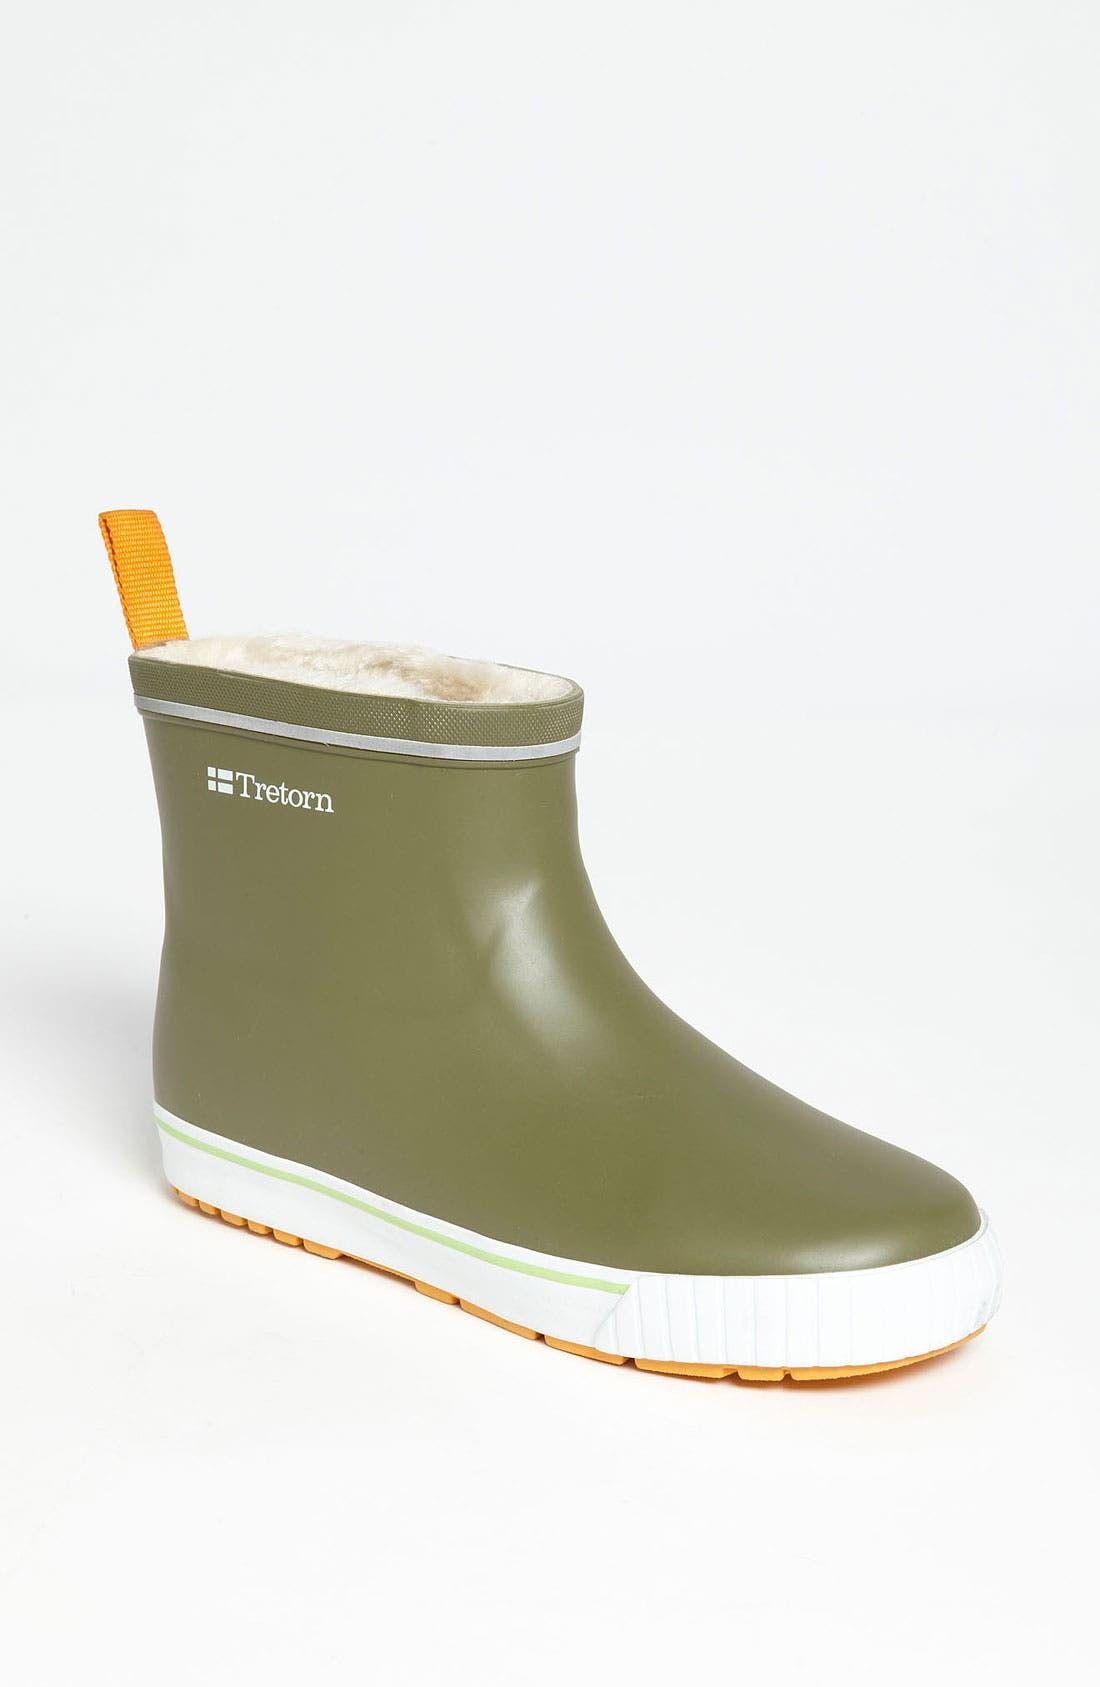 Alternate Image 1 Selected - Tretorn 'Skerry Spritz Vinter' Rain Boot (Women)